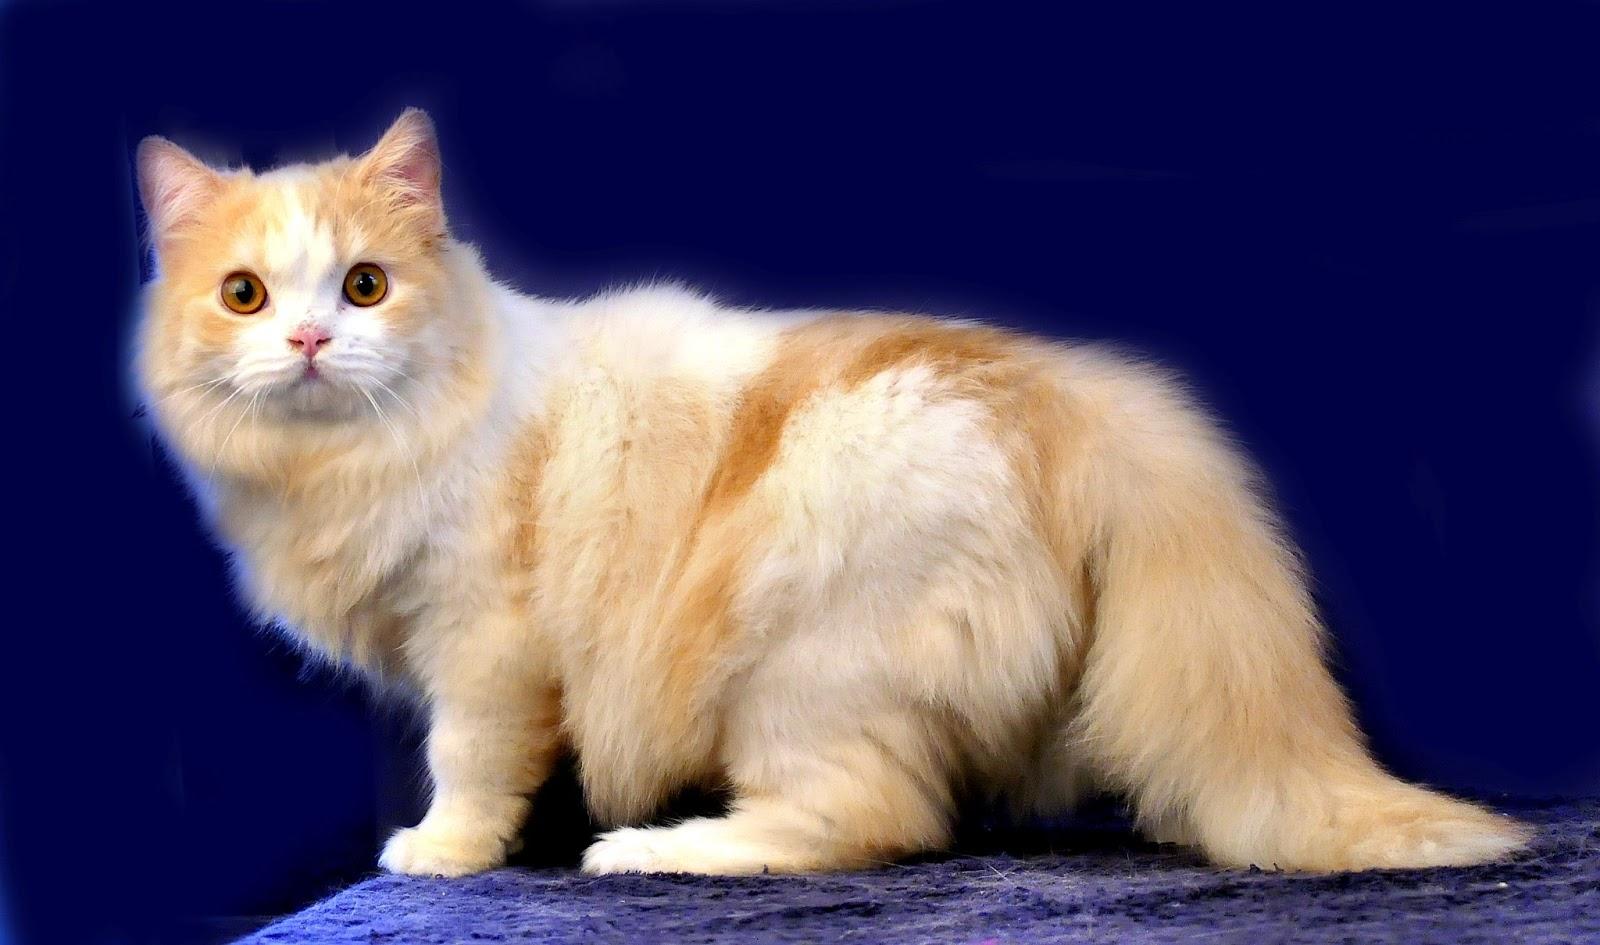 Download 87+  Gambar Kucing Persia Vs Anggora Paling Keren HD